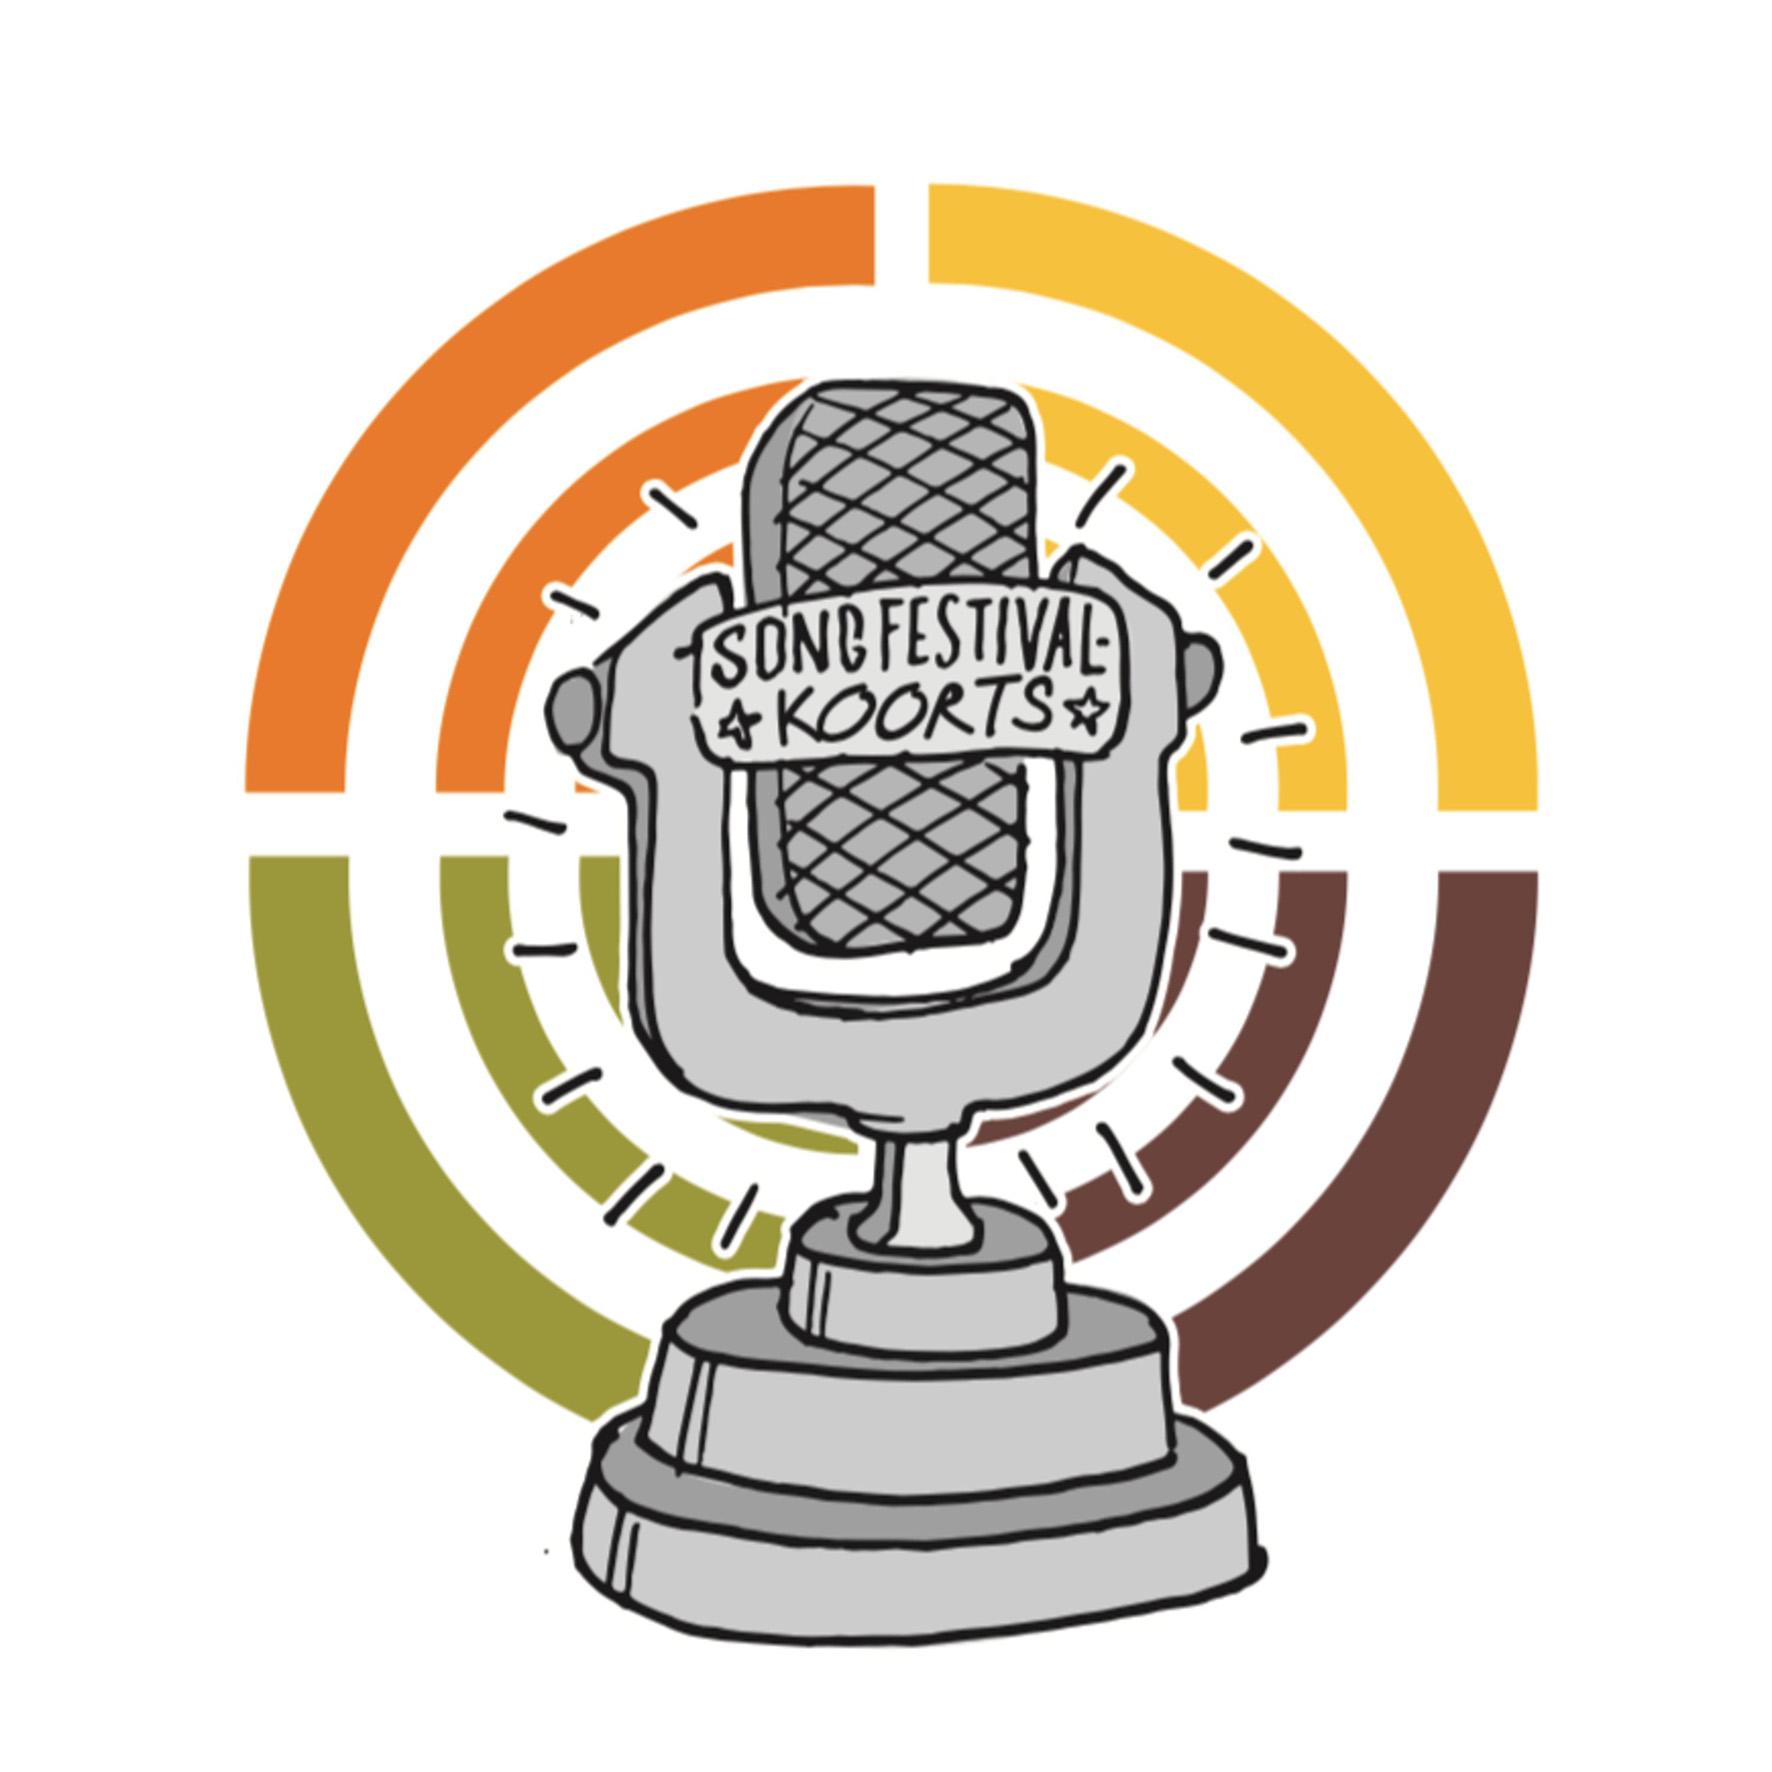 Ken je deze podcasts al? #25 Songfestival